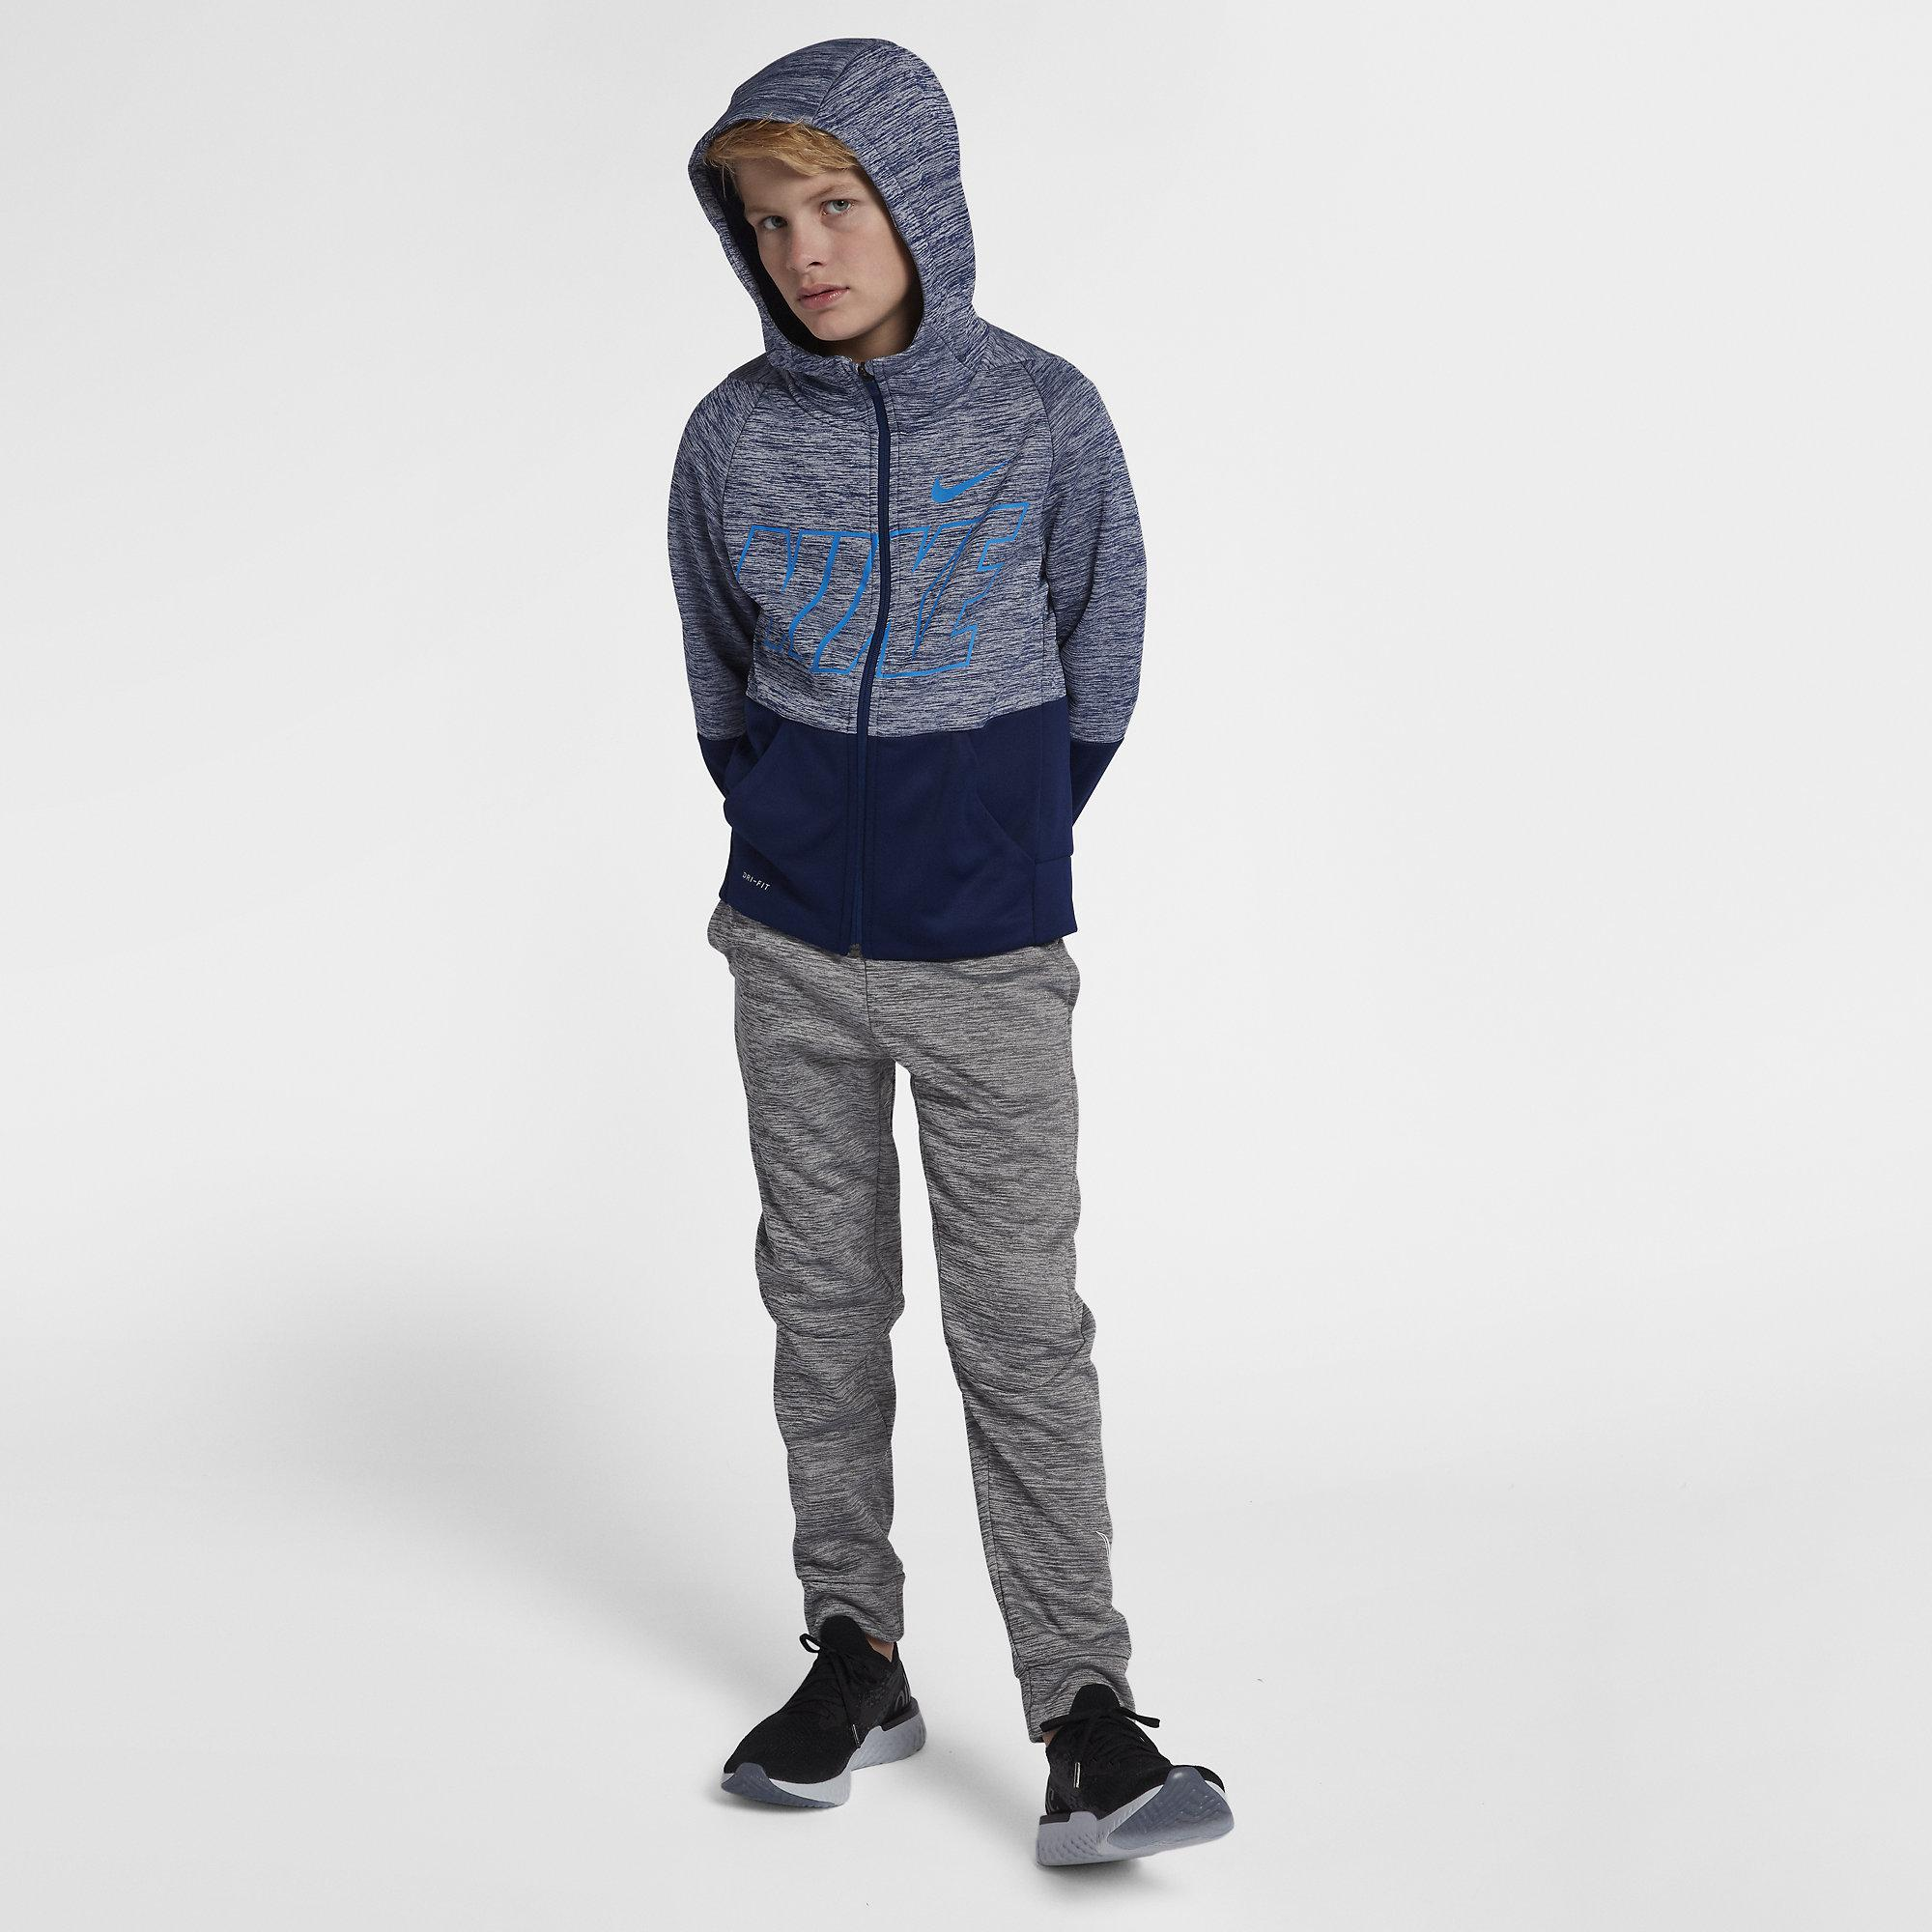 d35cb7c29 Nike Boys Dri-FIT Therma Full-Zip Training Hoodie - Blue Void/Blue ...